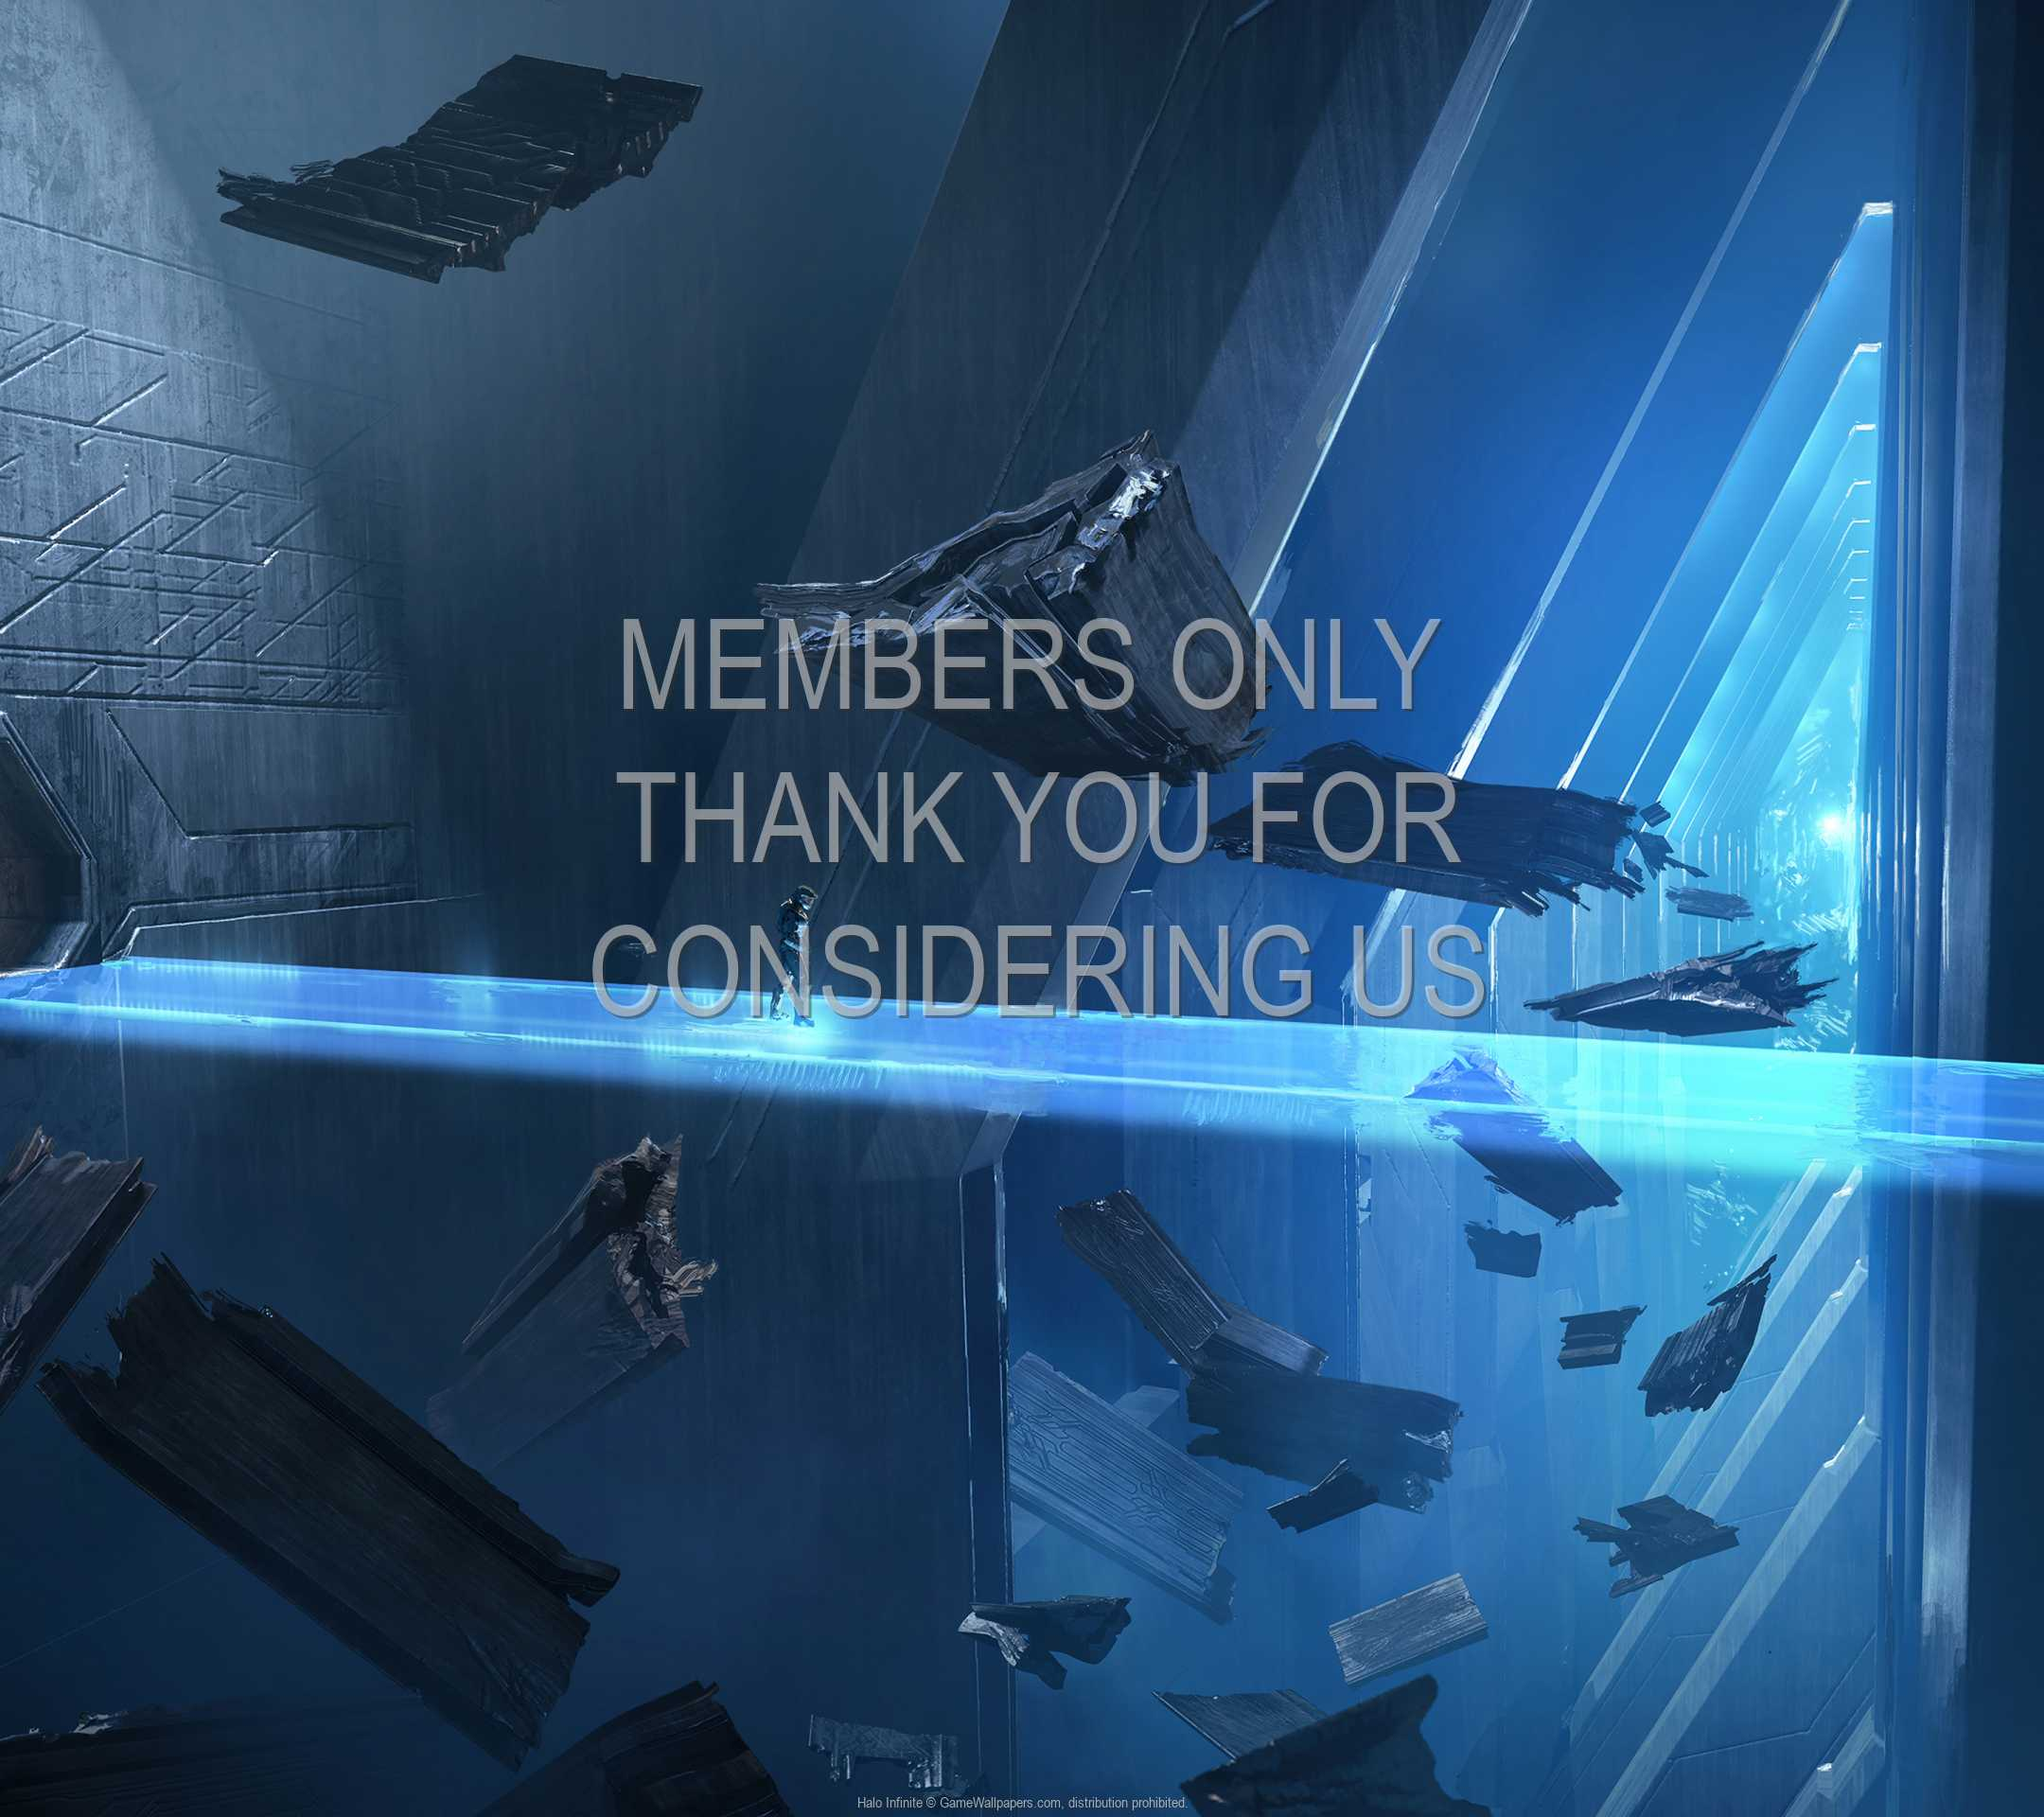 Halo: Infinite 1080p Horizontal Móvil fondo de escritorio 14